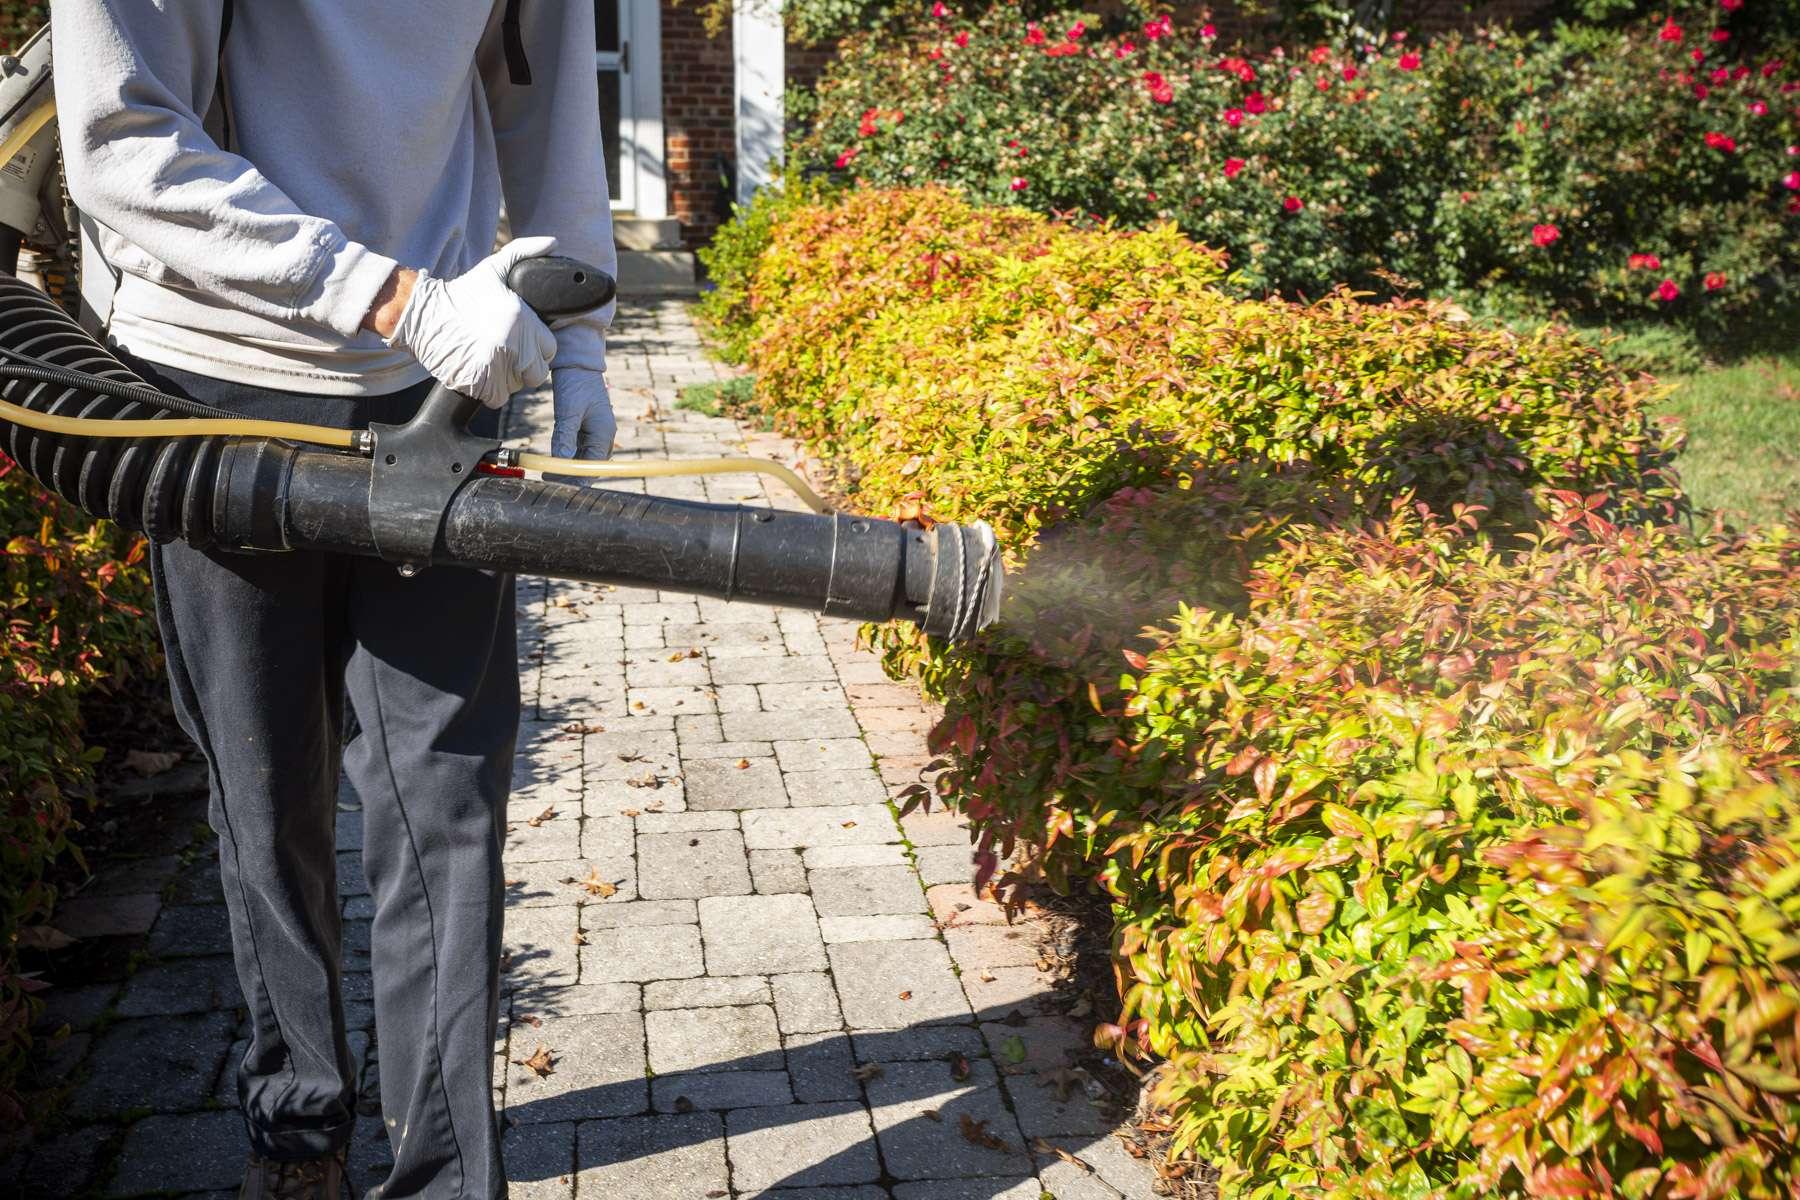 Pest control technician spraying for mosquitos